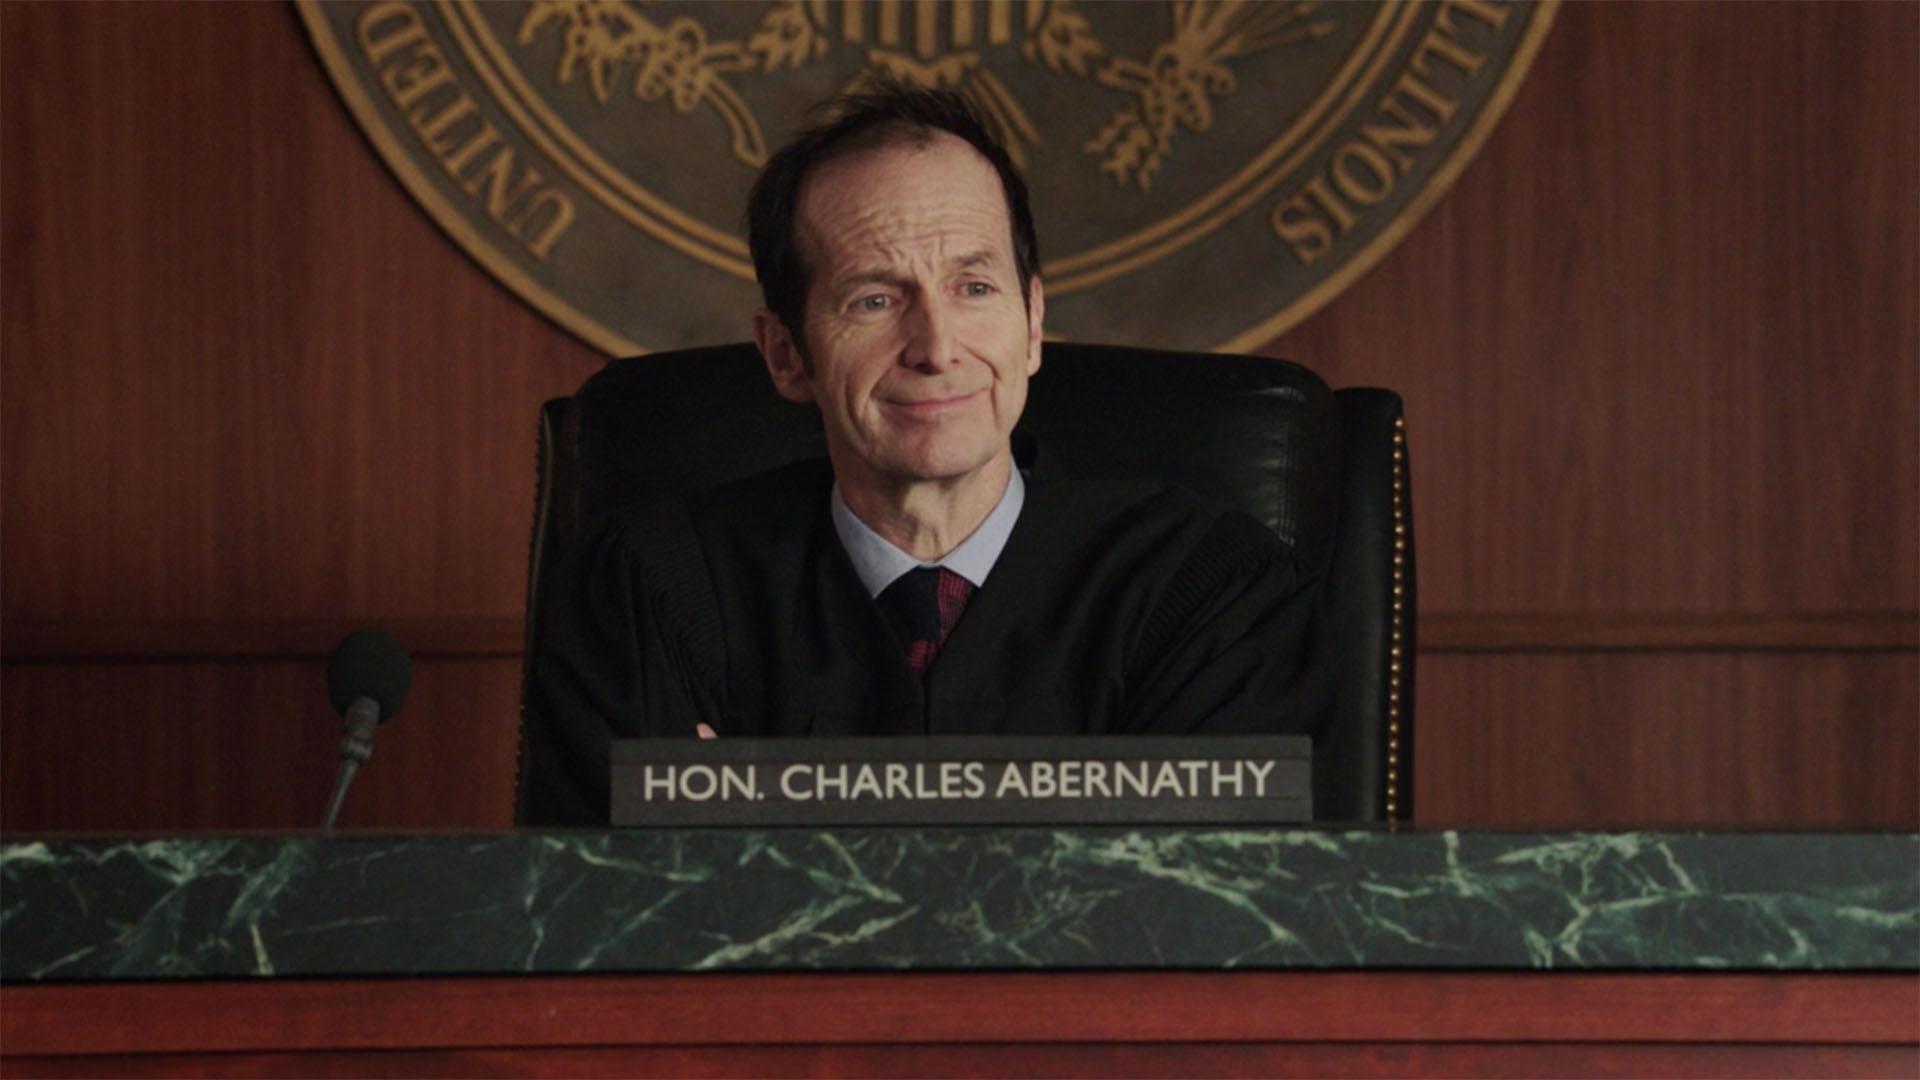 Denis O'Hare as Judge Charles Abernathy